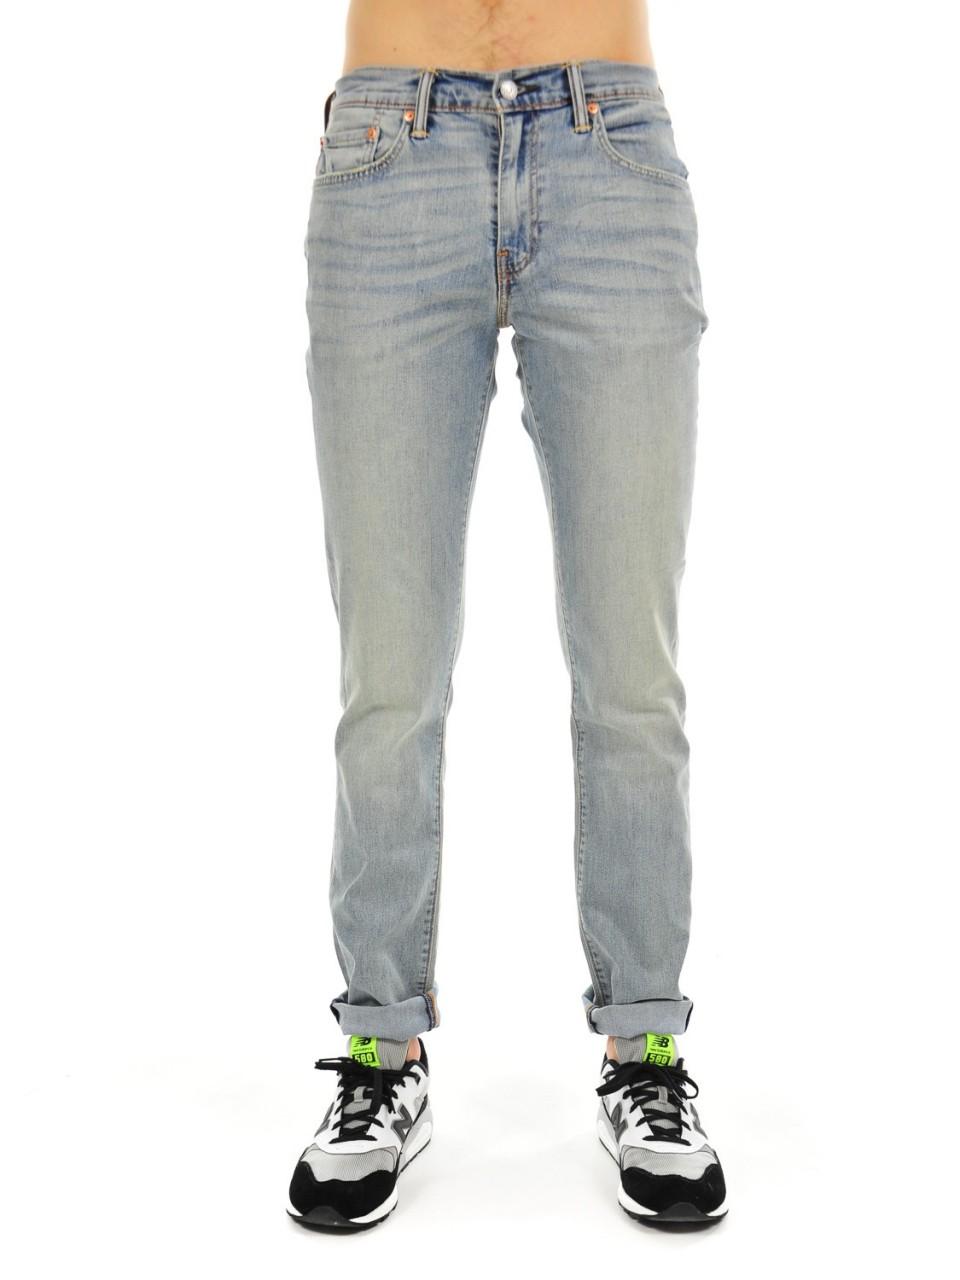 Levi's Uomo Jeans Uomo Levi's 511 Santa Barb 5111903D